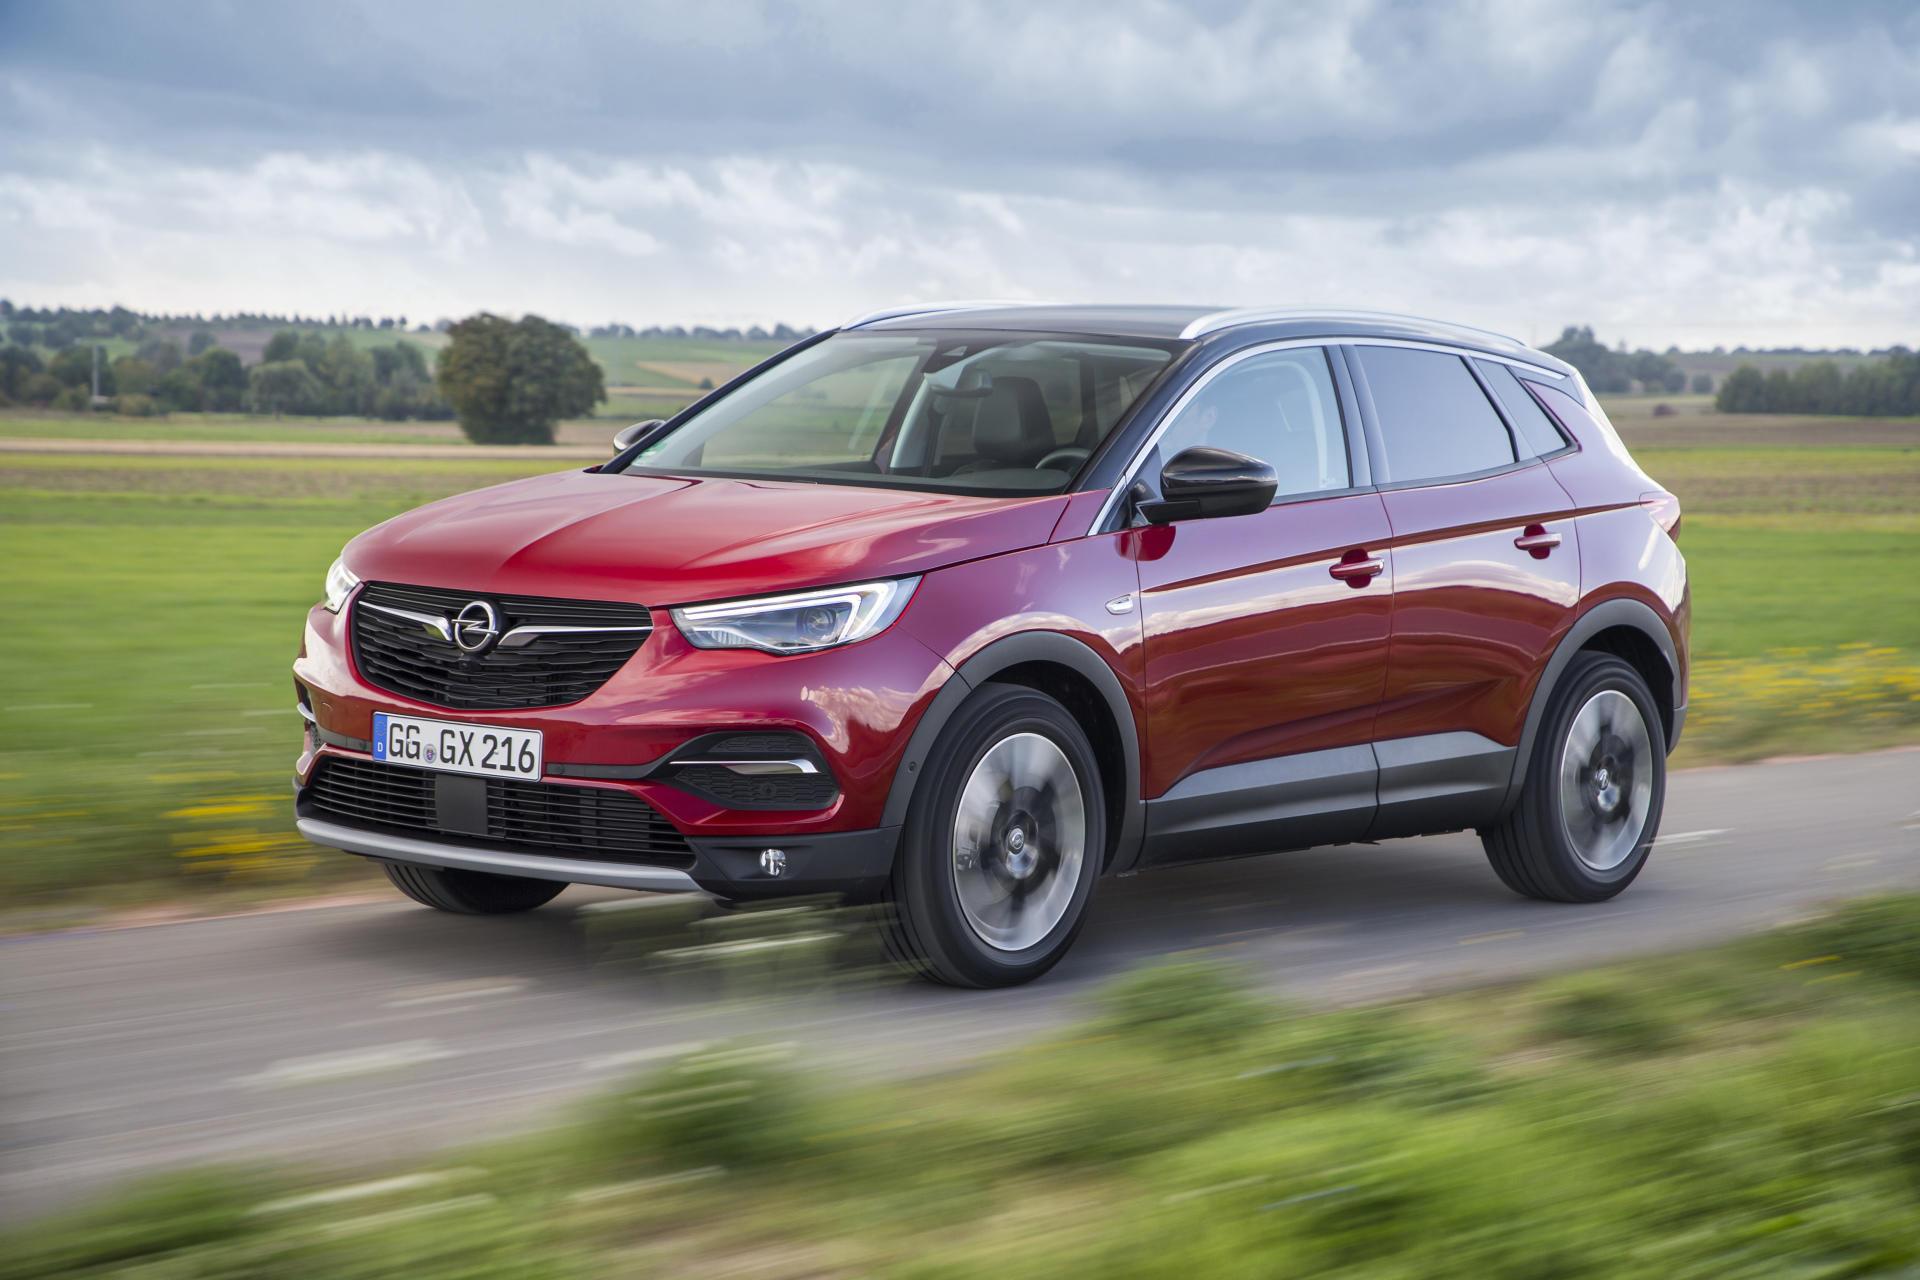 Opel Grandland X Precios Noticias Prueba Ficha T 233 Cnica